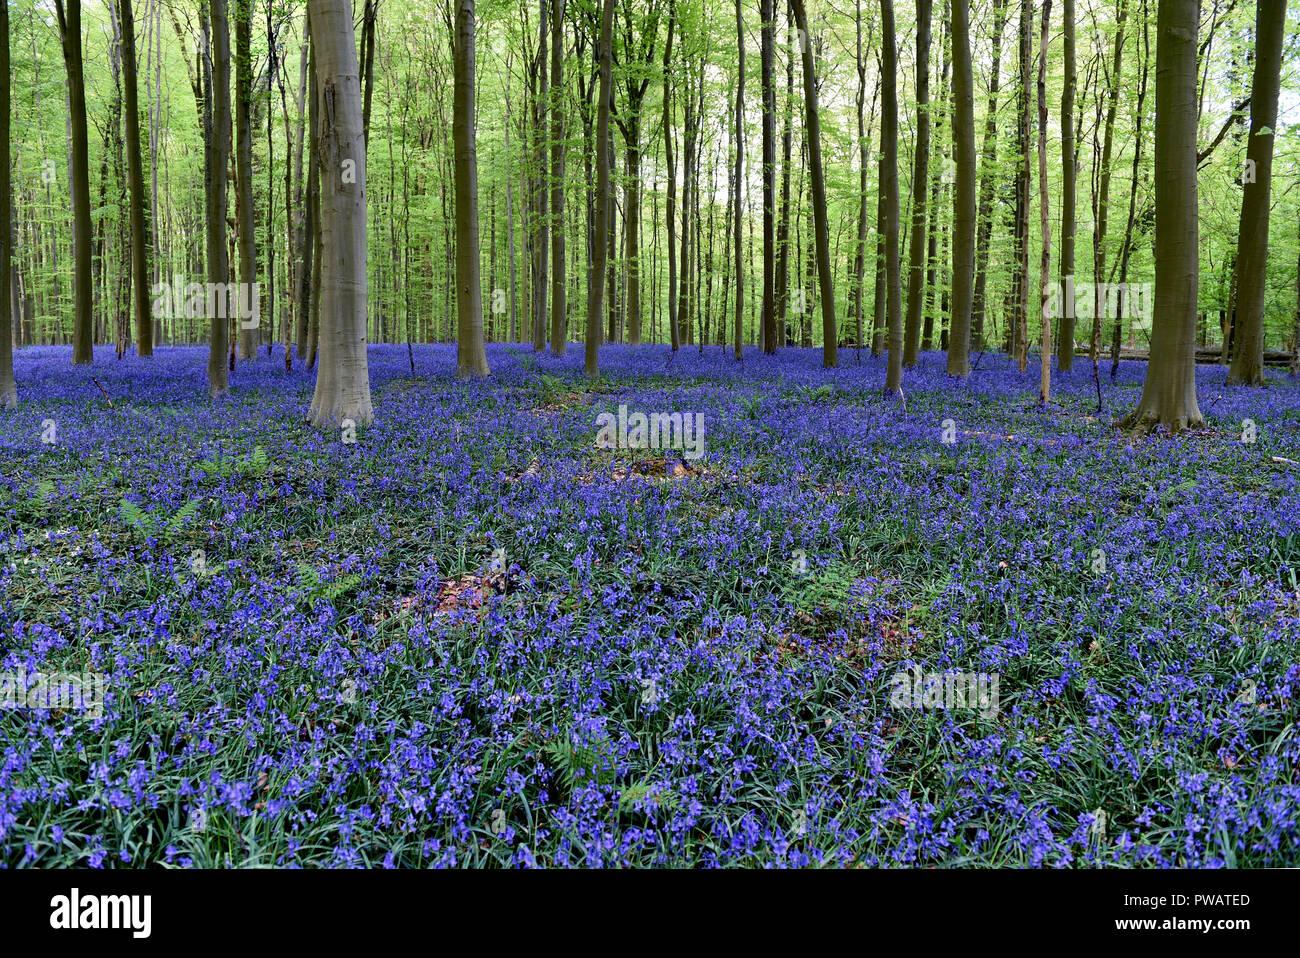 Hallerbos, the amazing bluebells wood - Stock Image